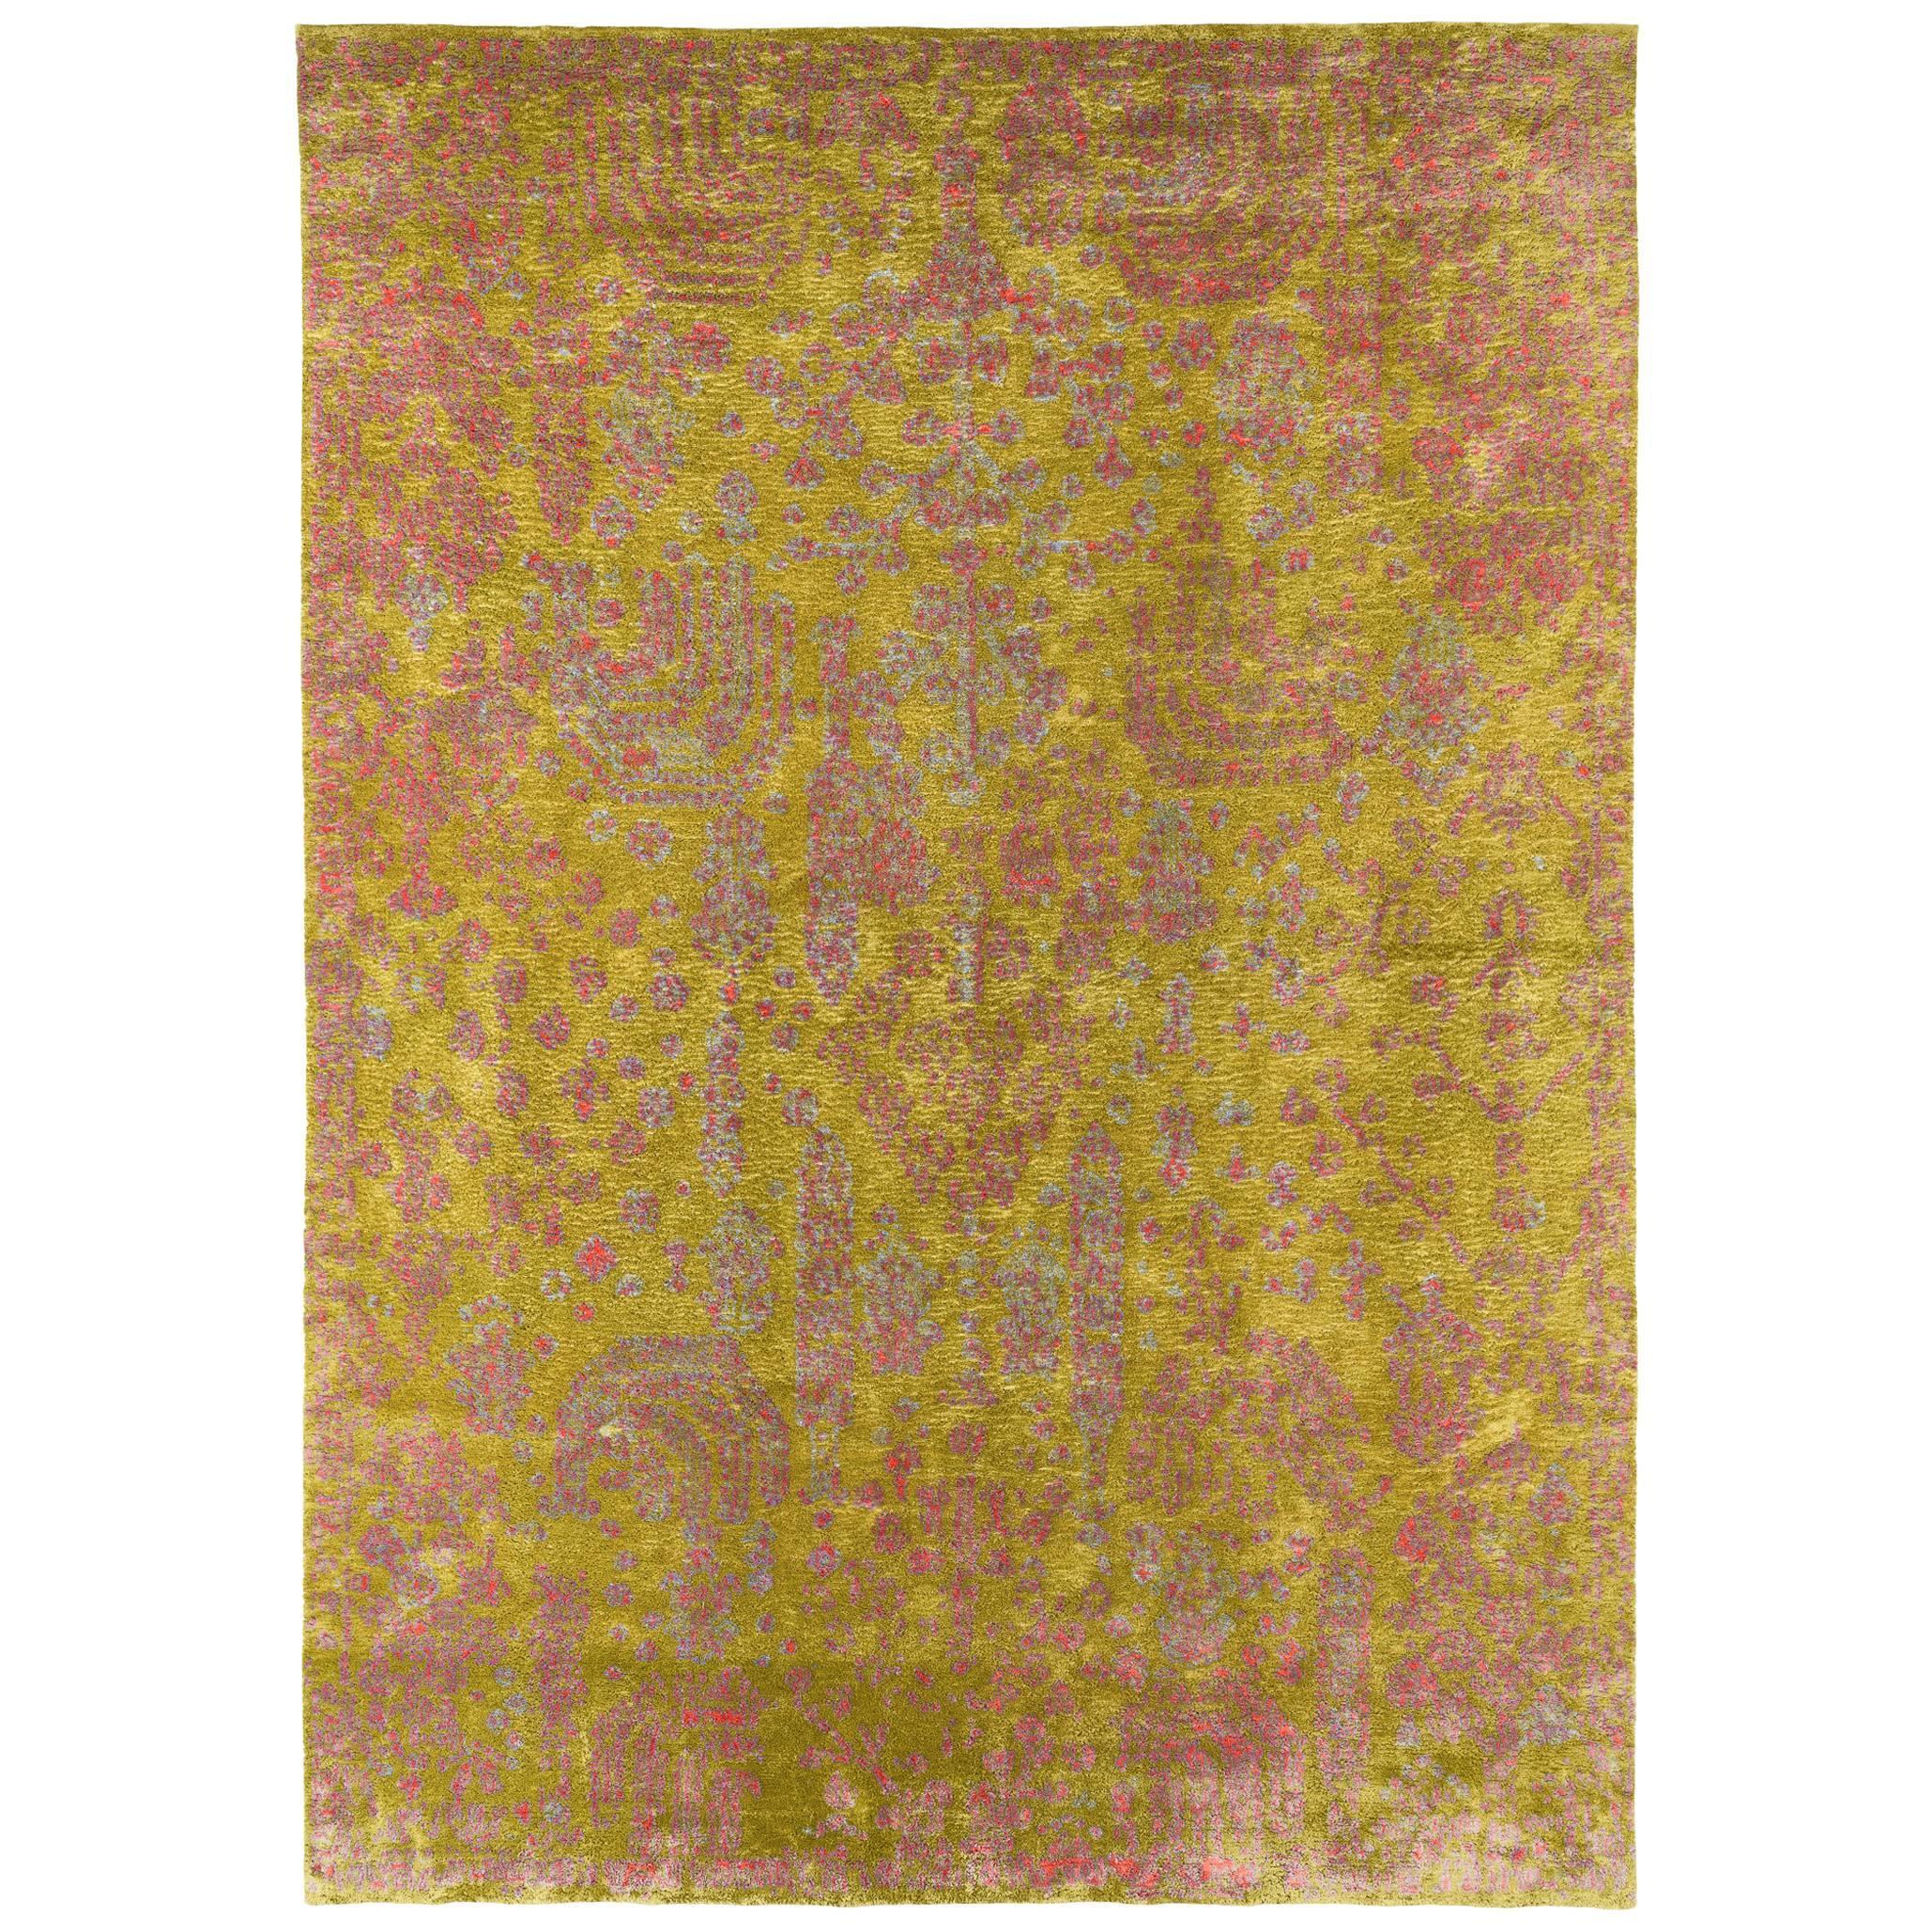 Contemporary Silk Rug By Carini 10x14